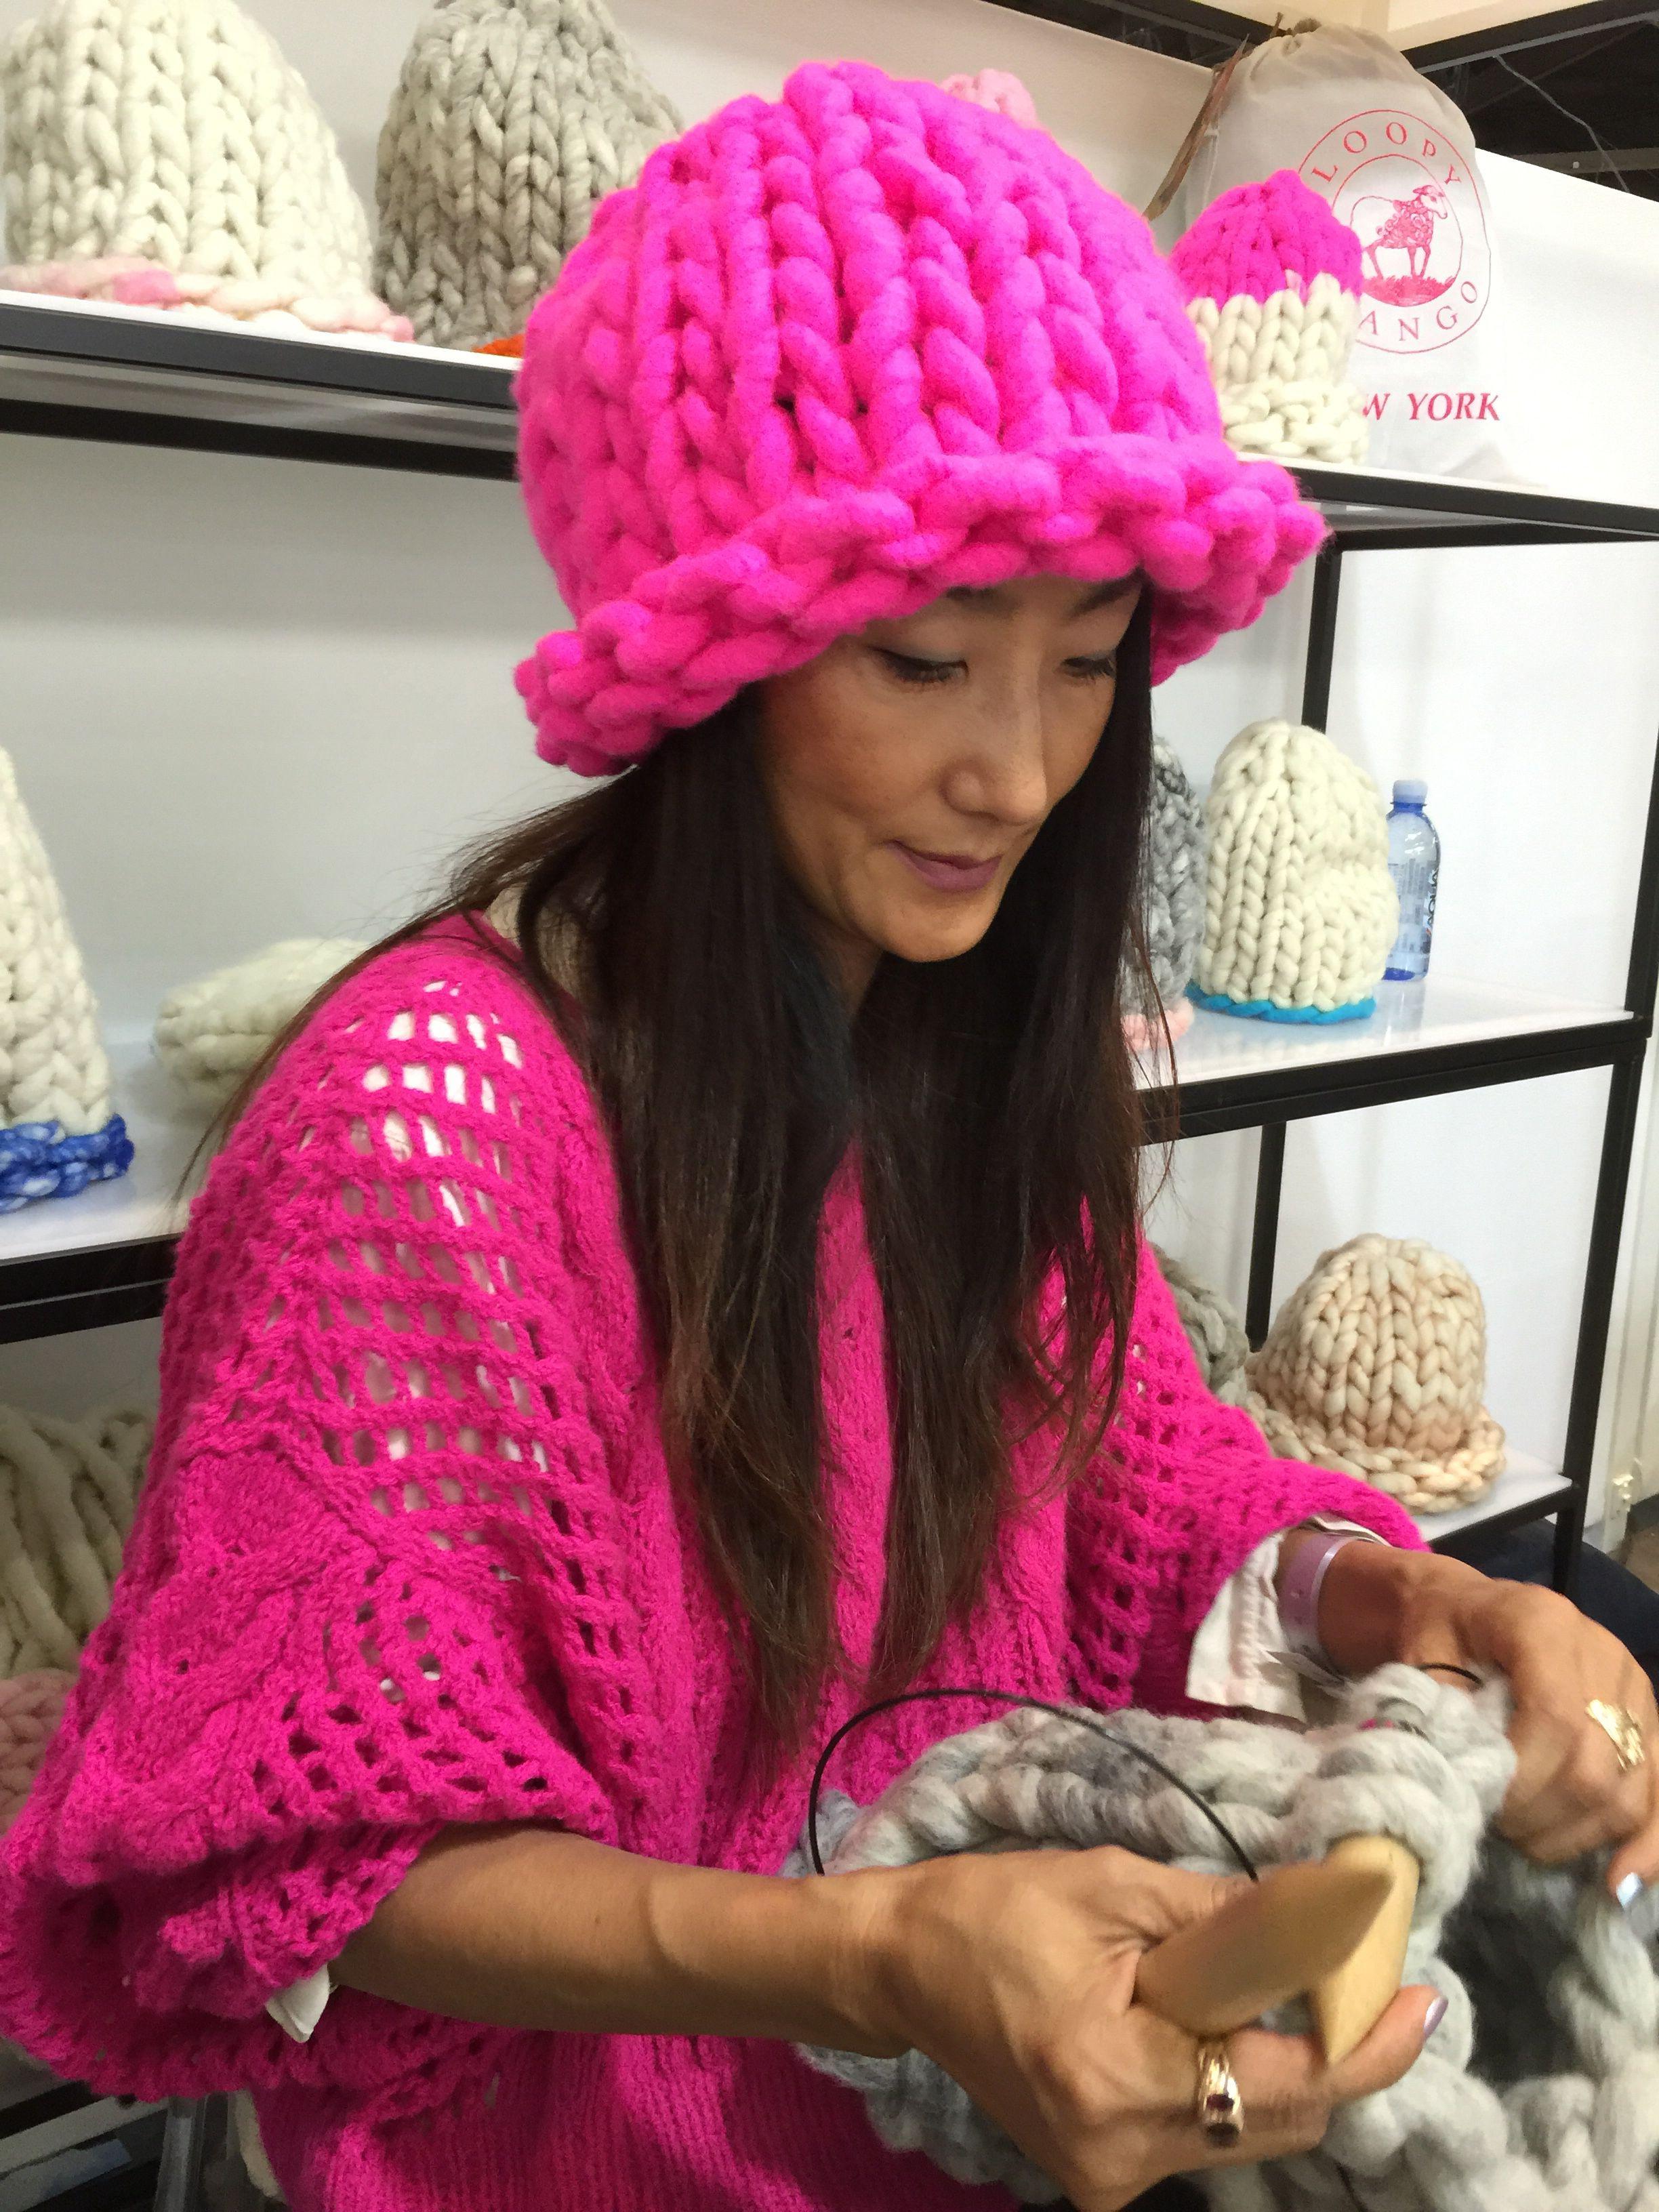 Waejong Kim - cofounder of Loopy Mango wearing Loopy Mango Helsinki Hat and Ryan Roche sweater and knitting with Big Loop Yarn